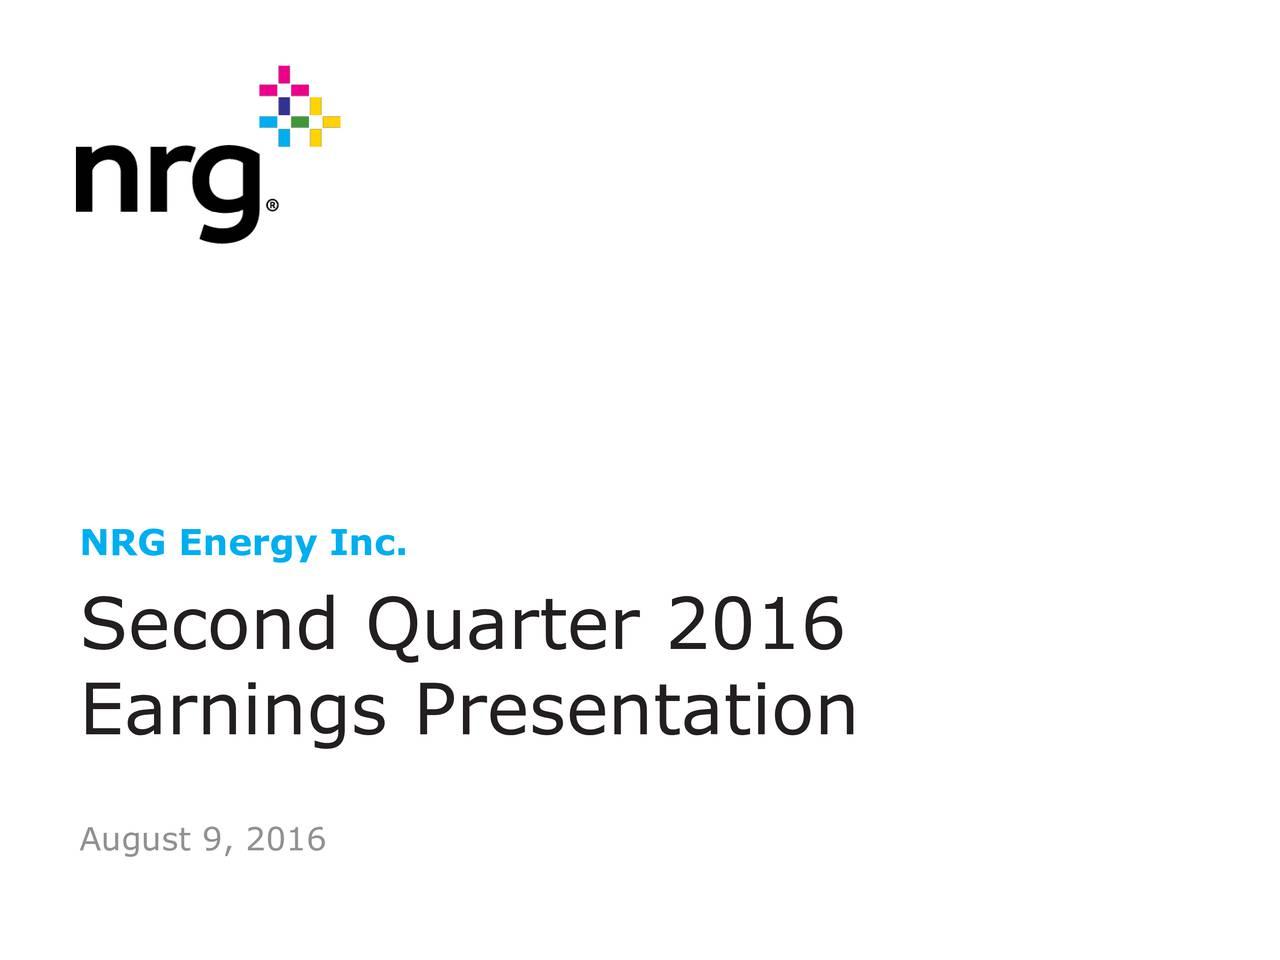 Second Quarter 2016 Earnings Presentation August 9, 2016